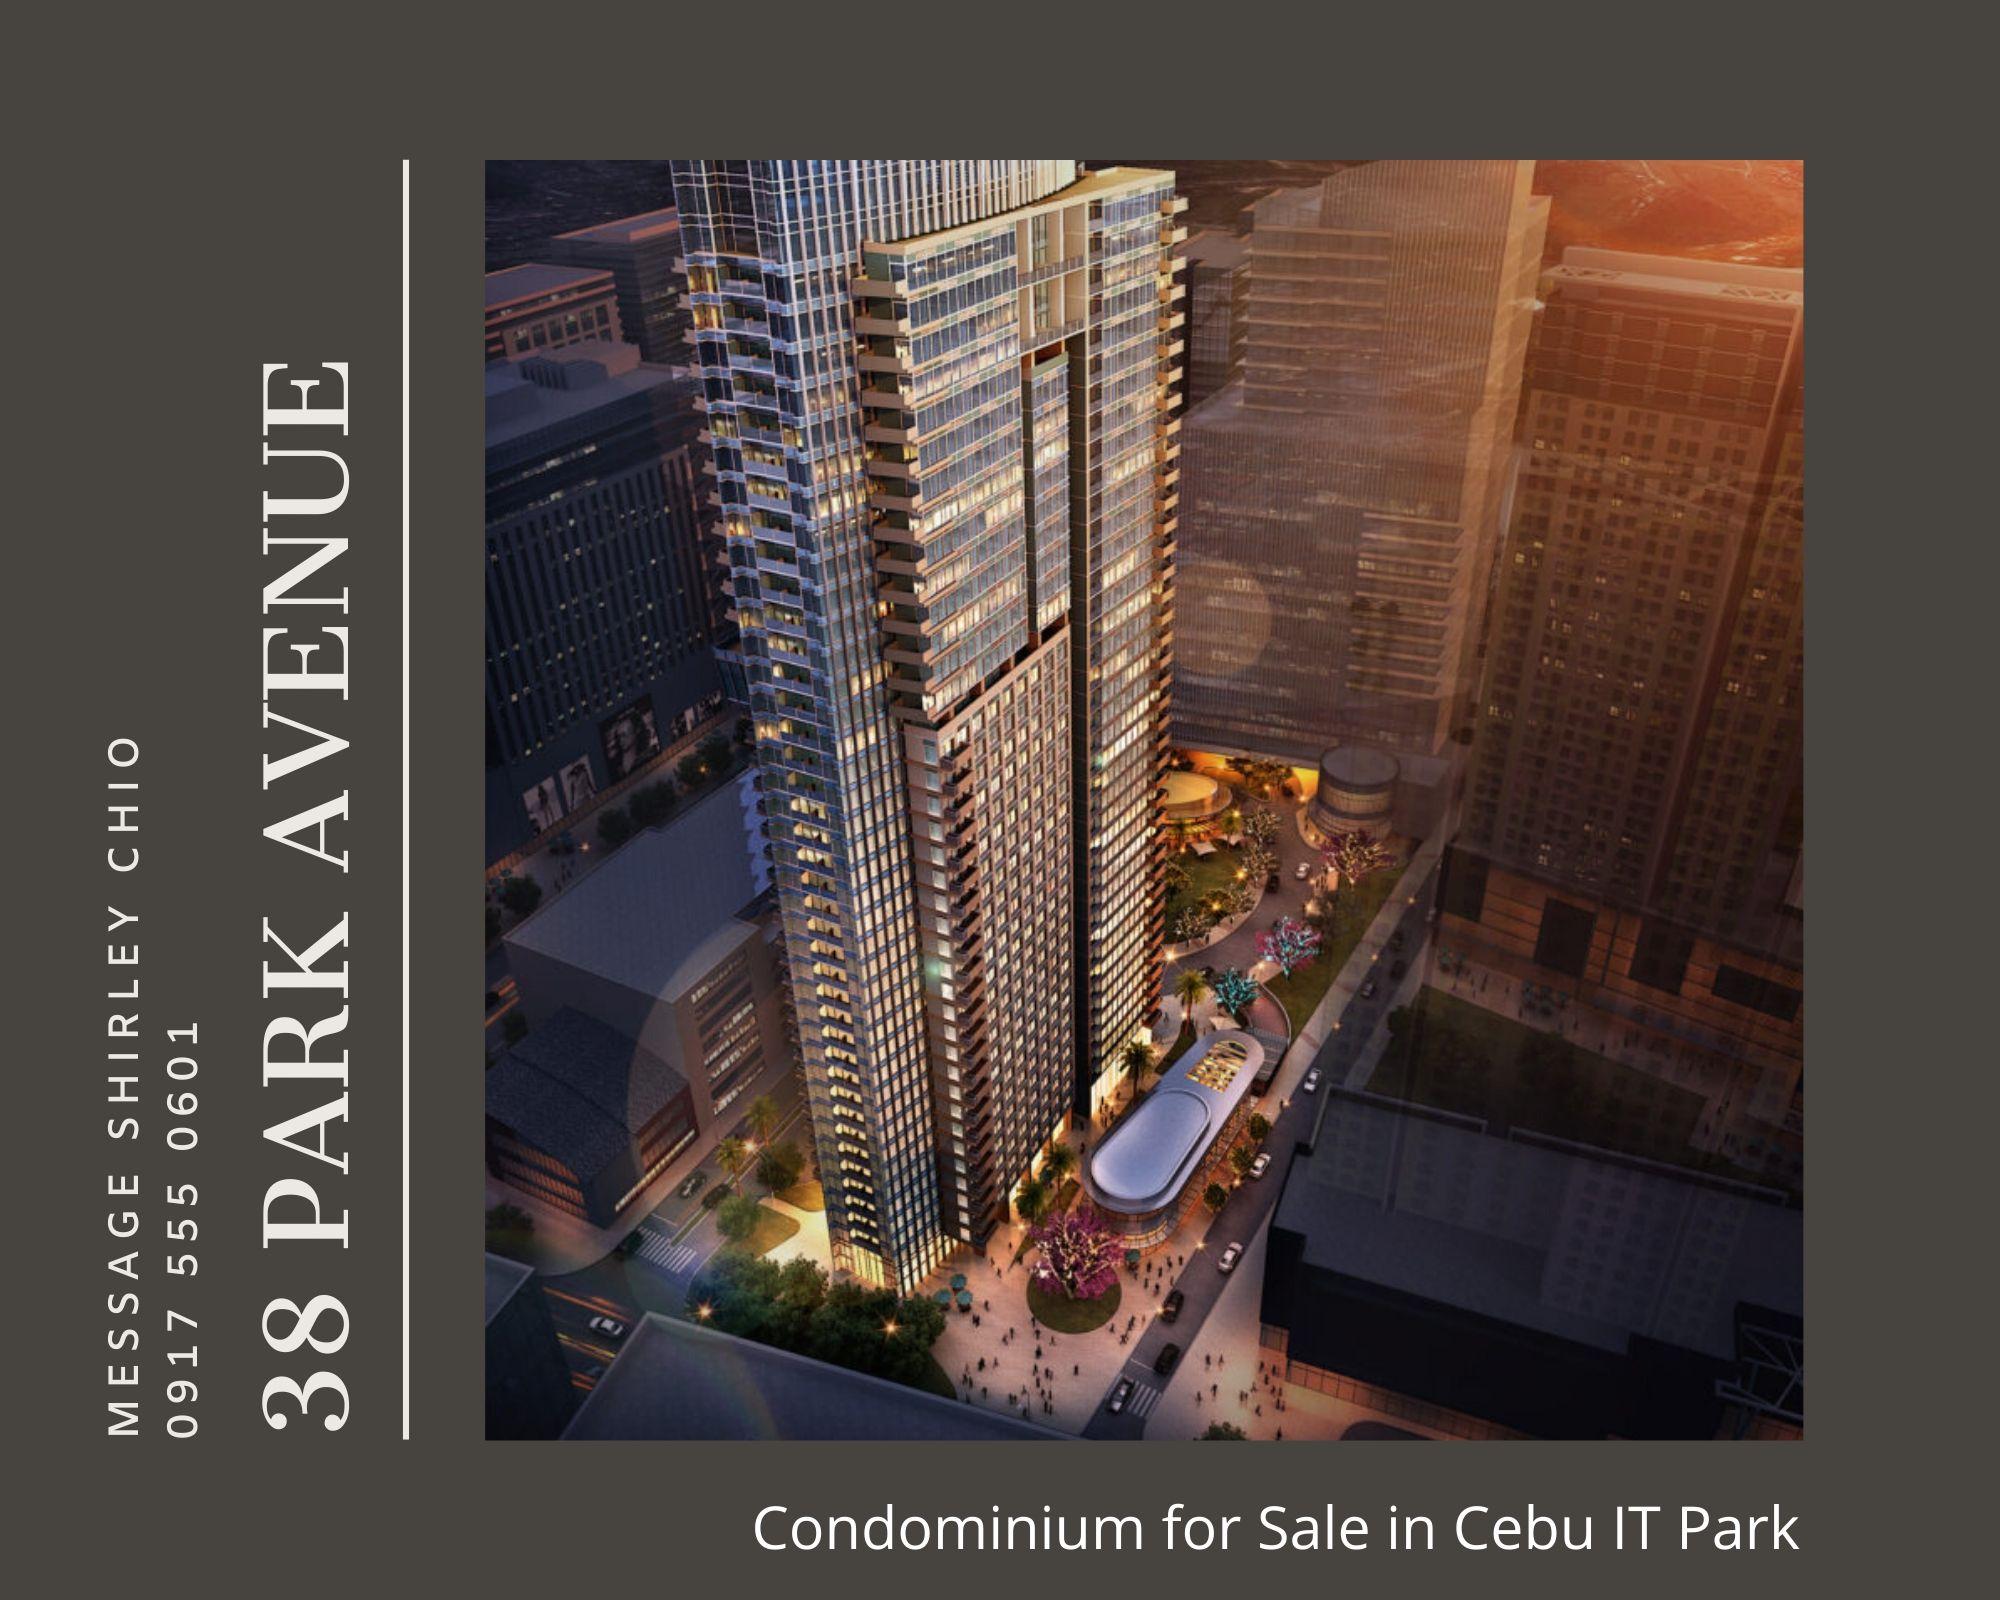 38 Park Avenue Condominium for Sale IT Park